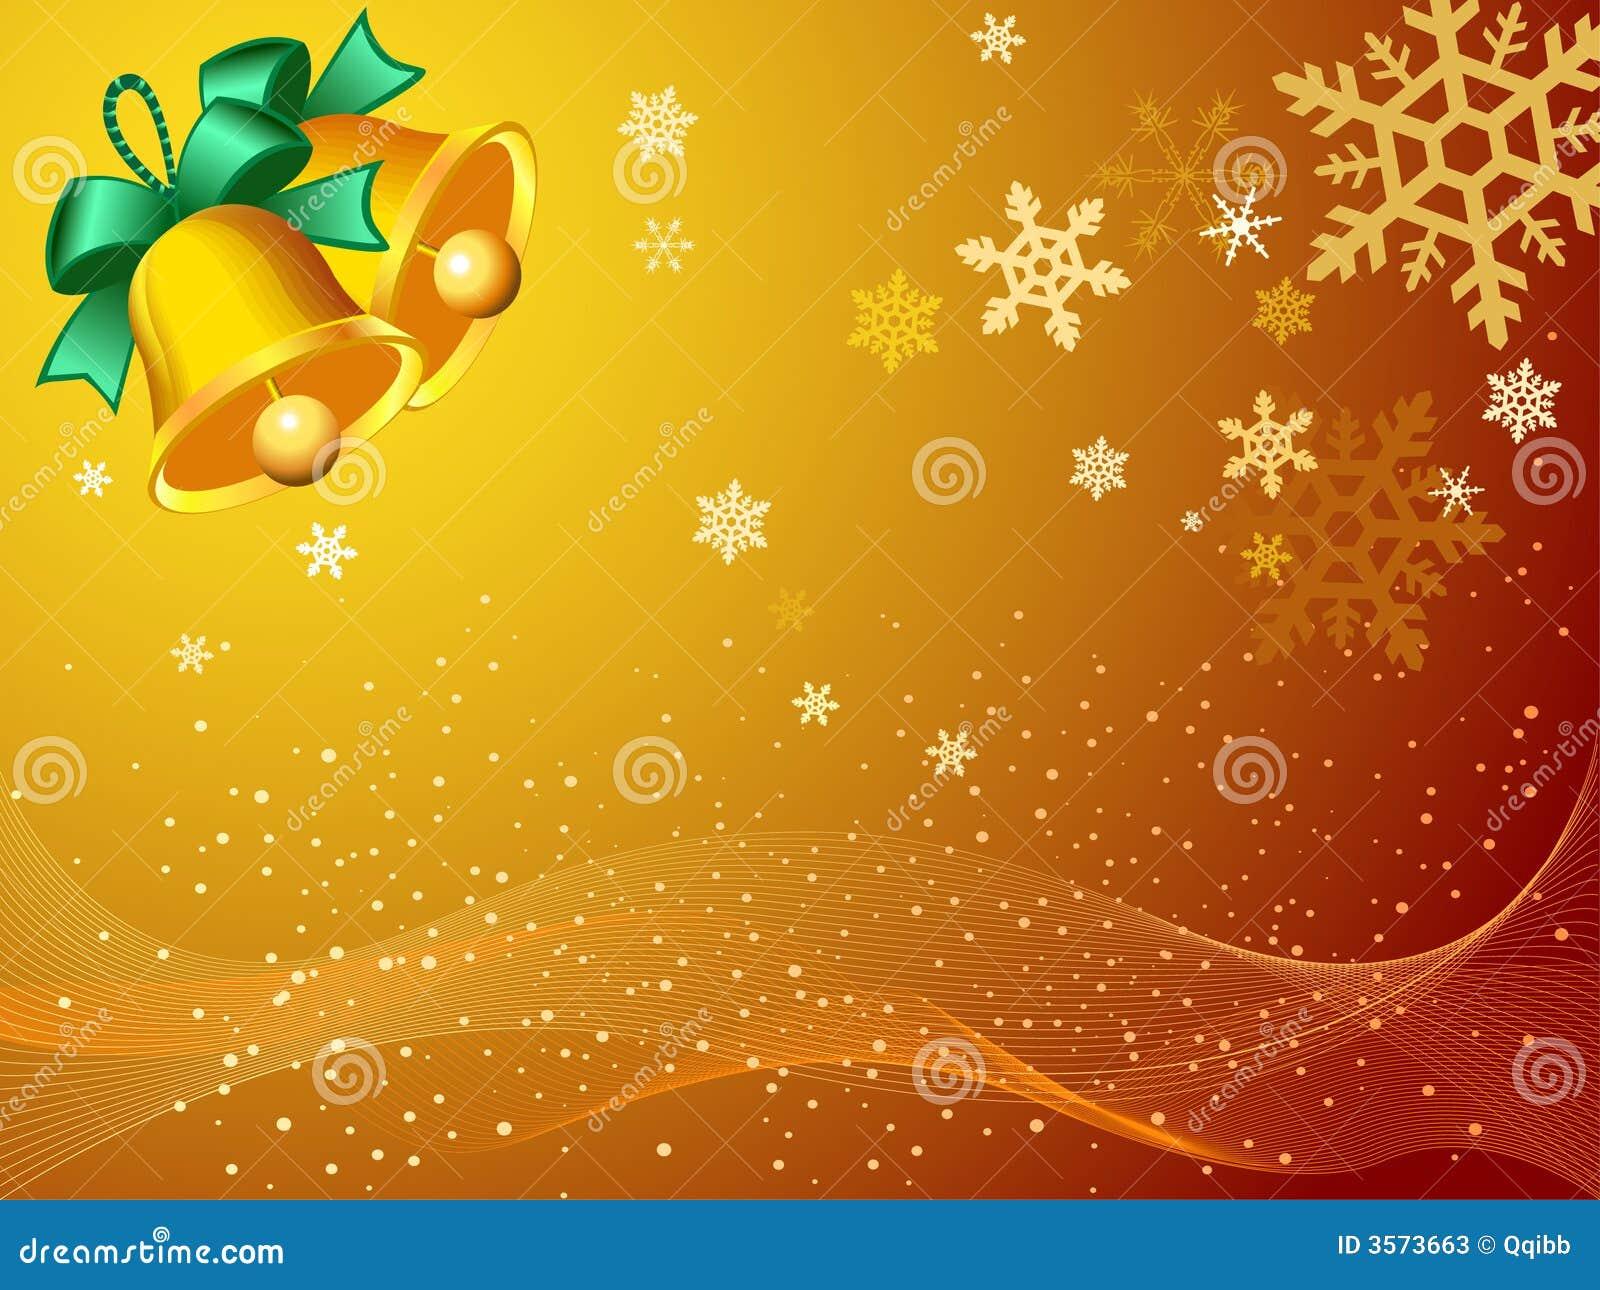 Fancy Wallpaper Christmas Fancy Wallpaper Stock Photos Image 3573663